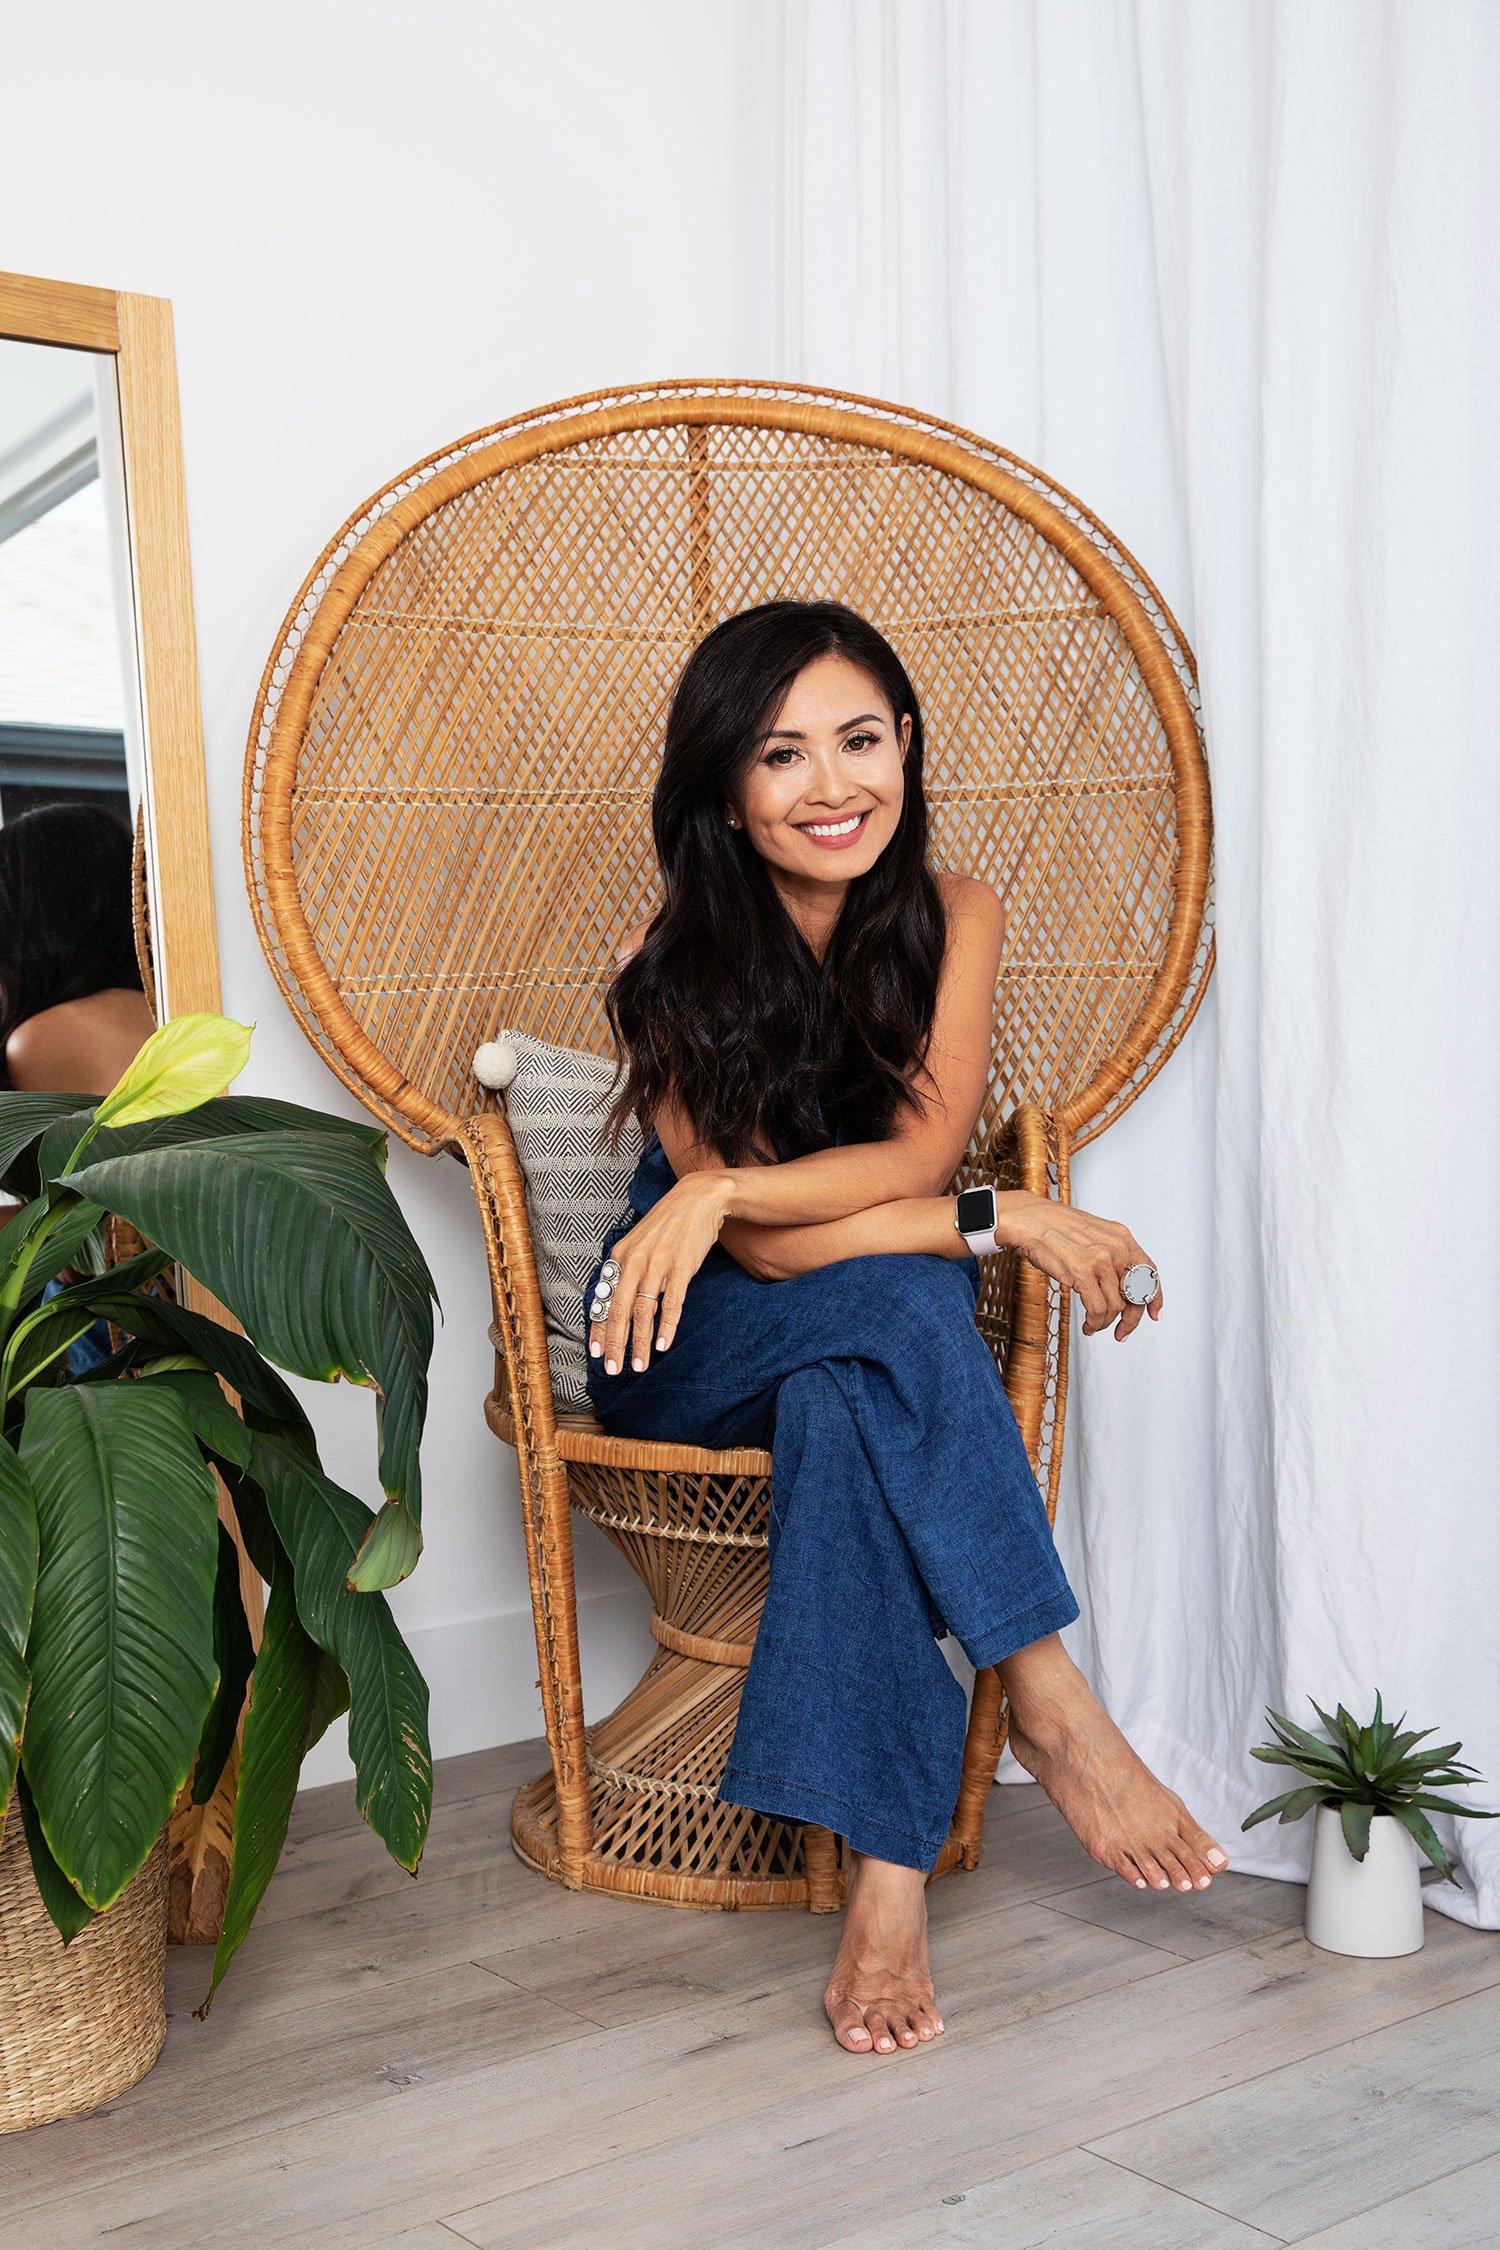 Take a sit, relax, and enjoy your resting time - Kalika Yap